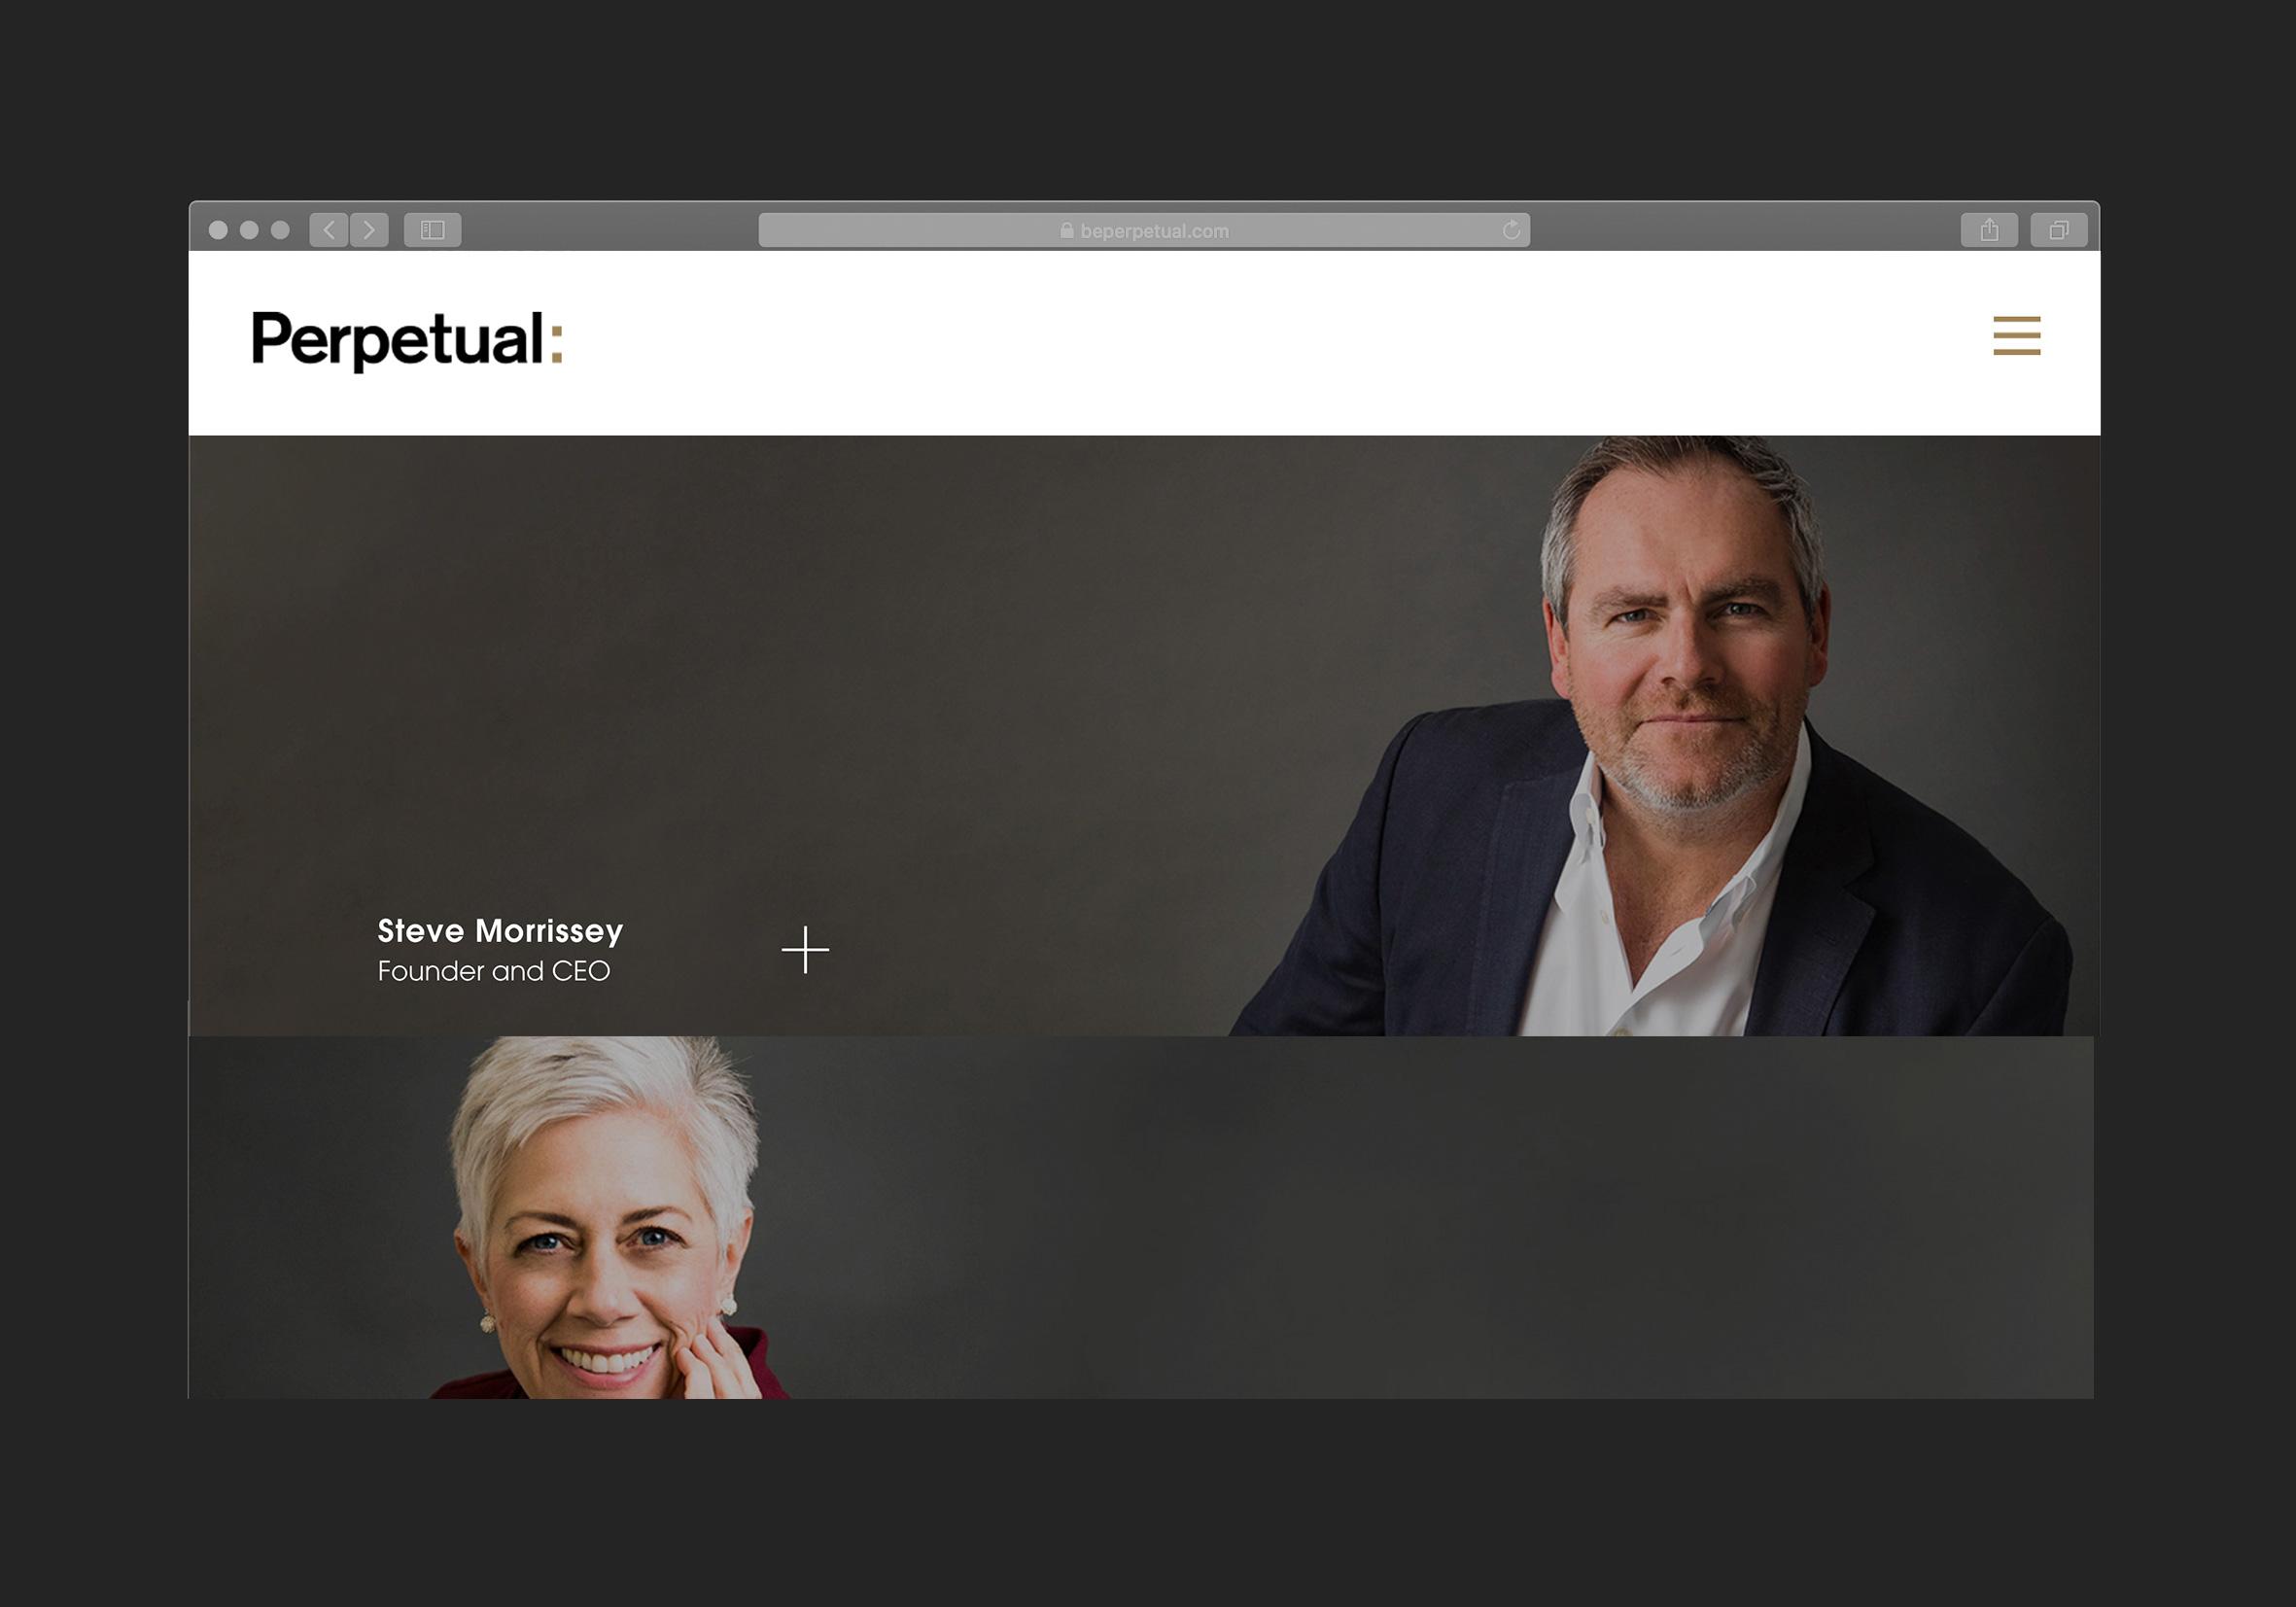 be-perpetual-webmockup-4